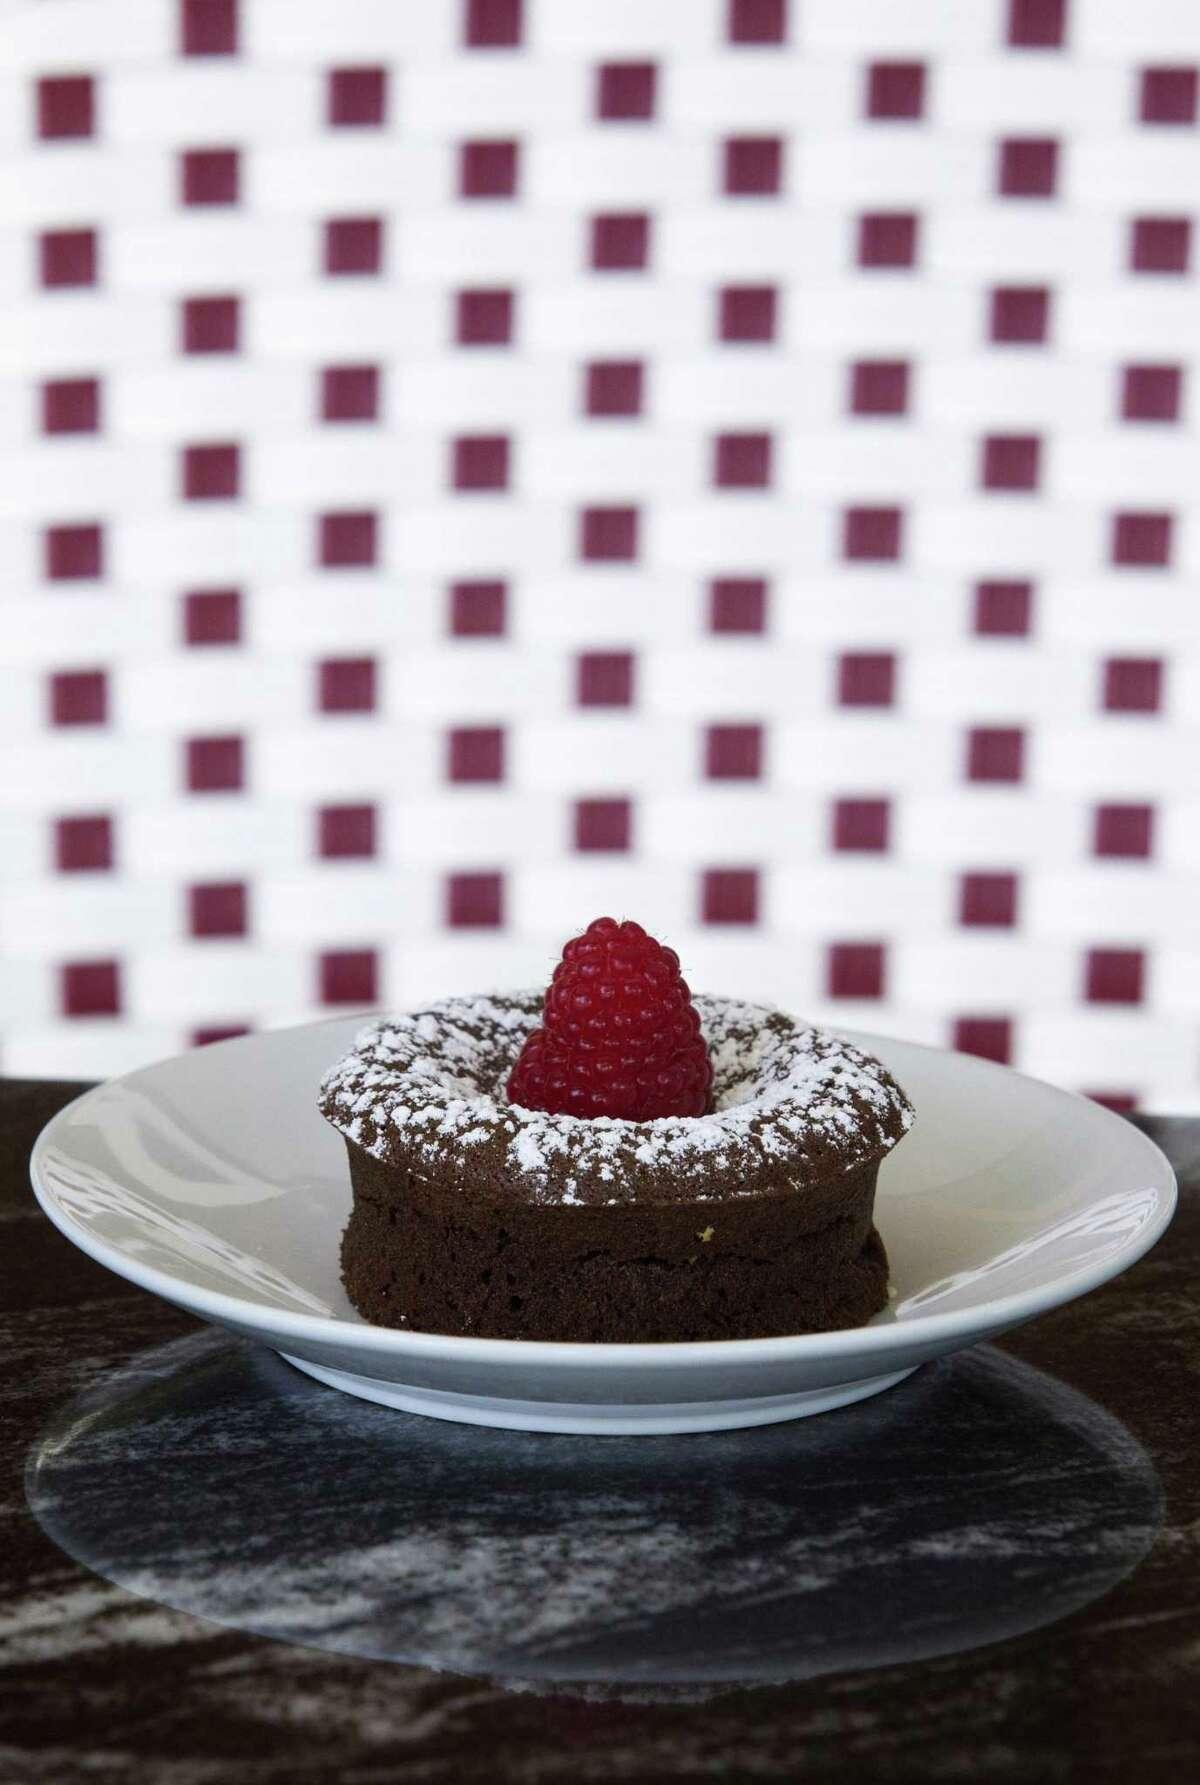 Fondant au chocolat at CommonWealth Coffeehouse and Bakery